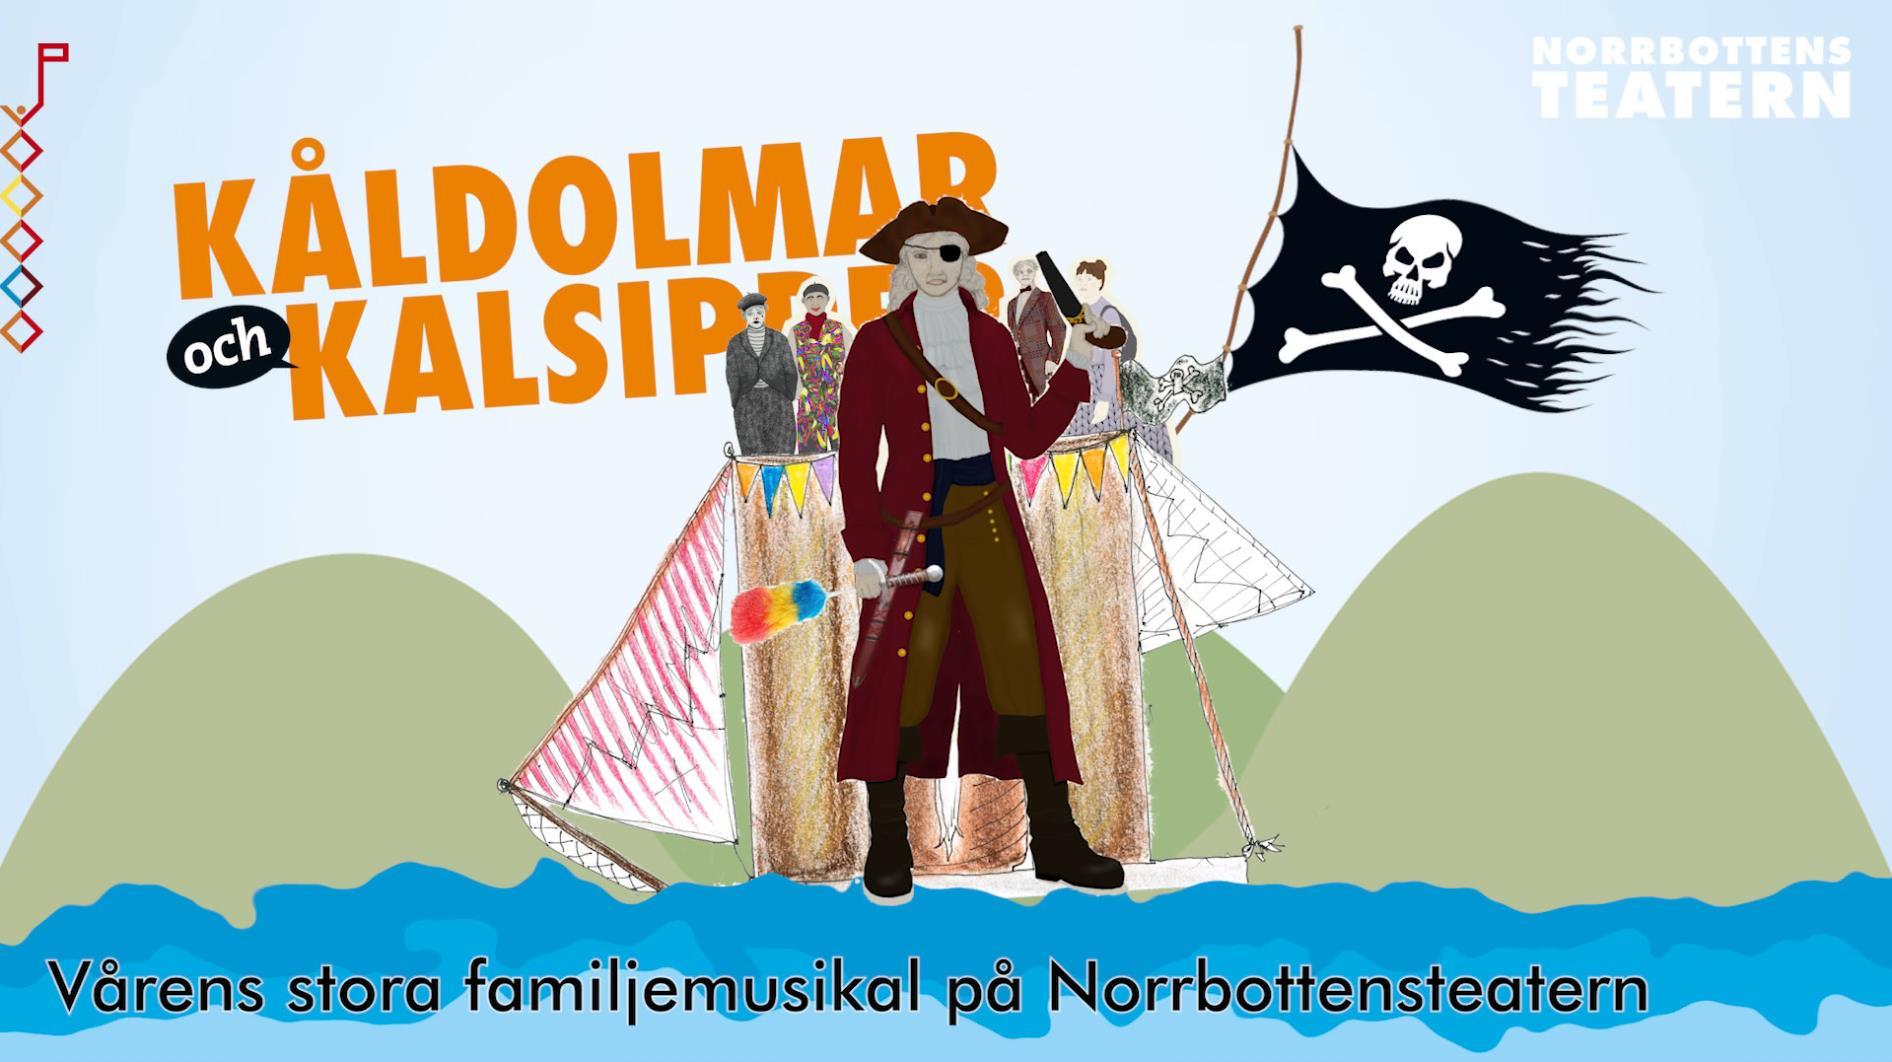 Kåldolmar och kalsipper - Norrbottensteatern 2019